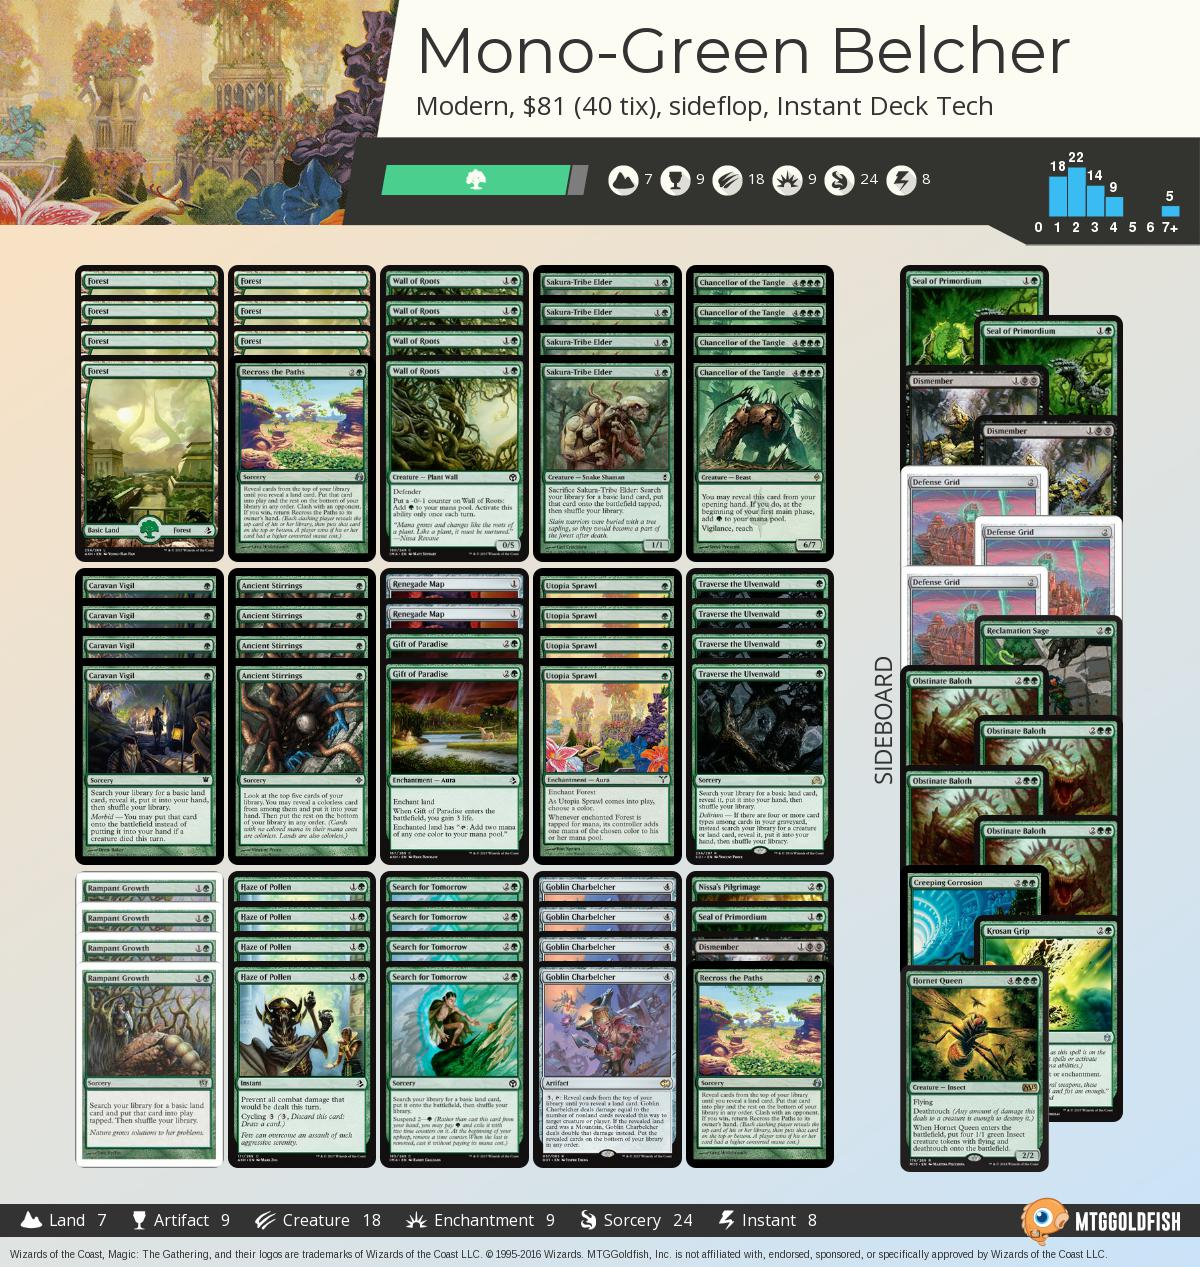 Mono green%2bbelcher 654e9299 7fa2 4948 98b0 af35008e3b68%2ejpg